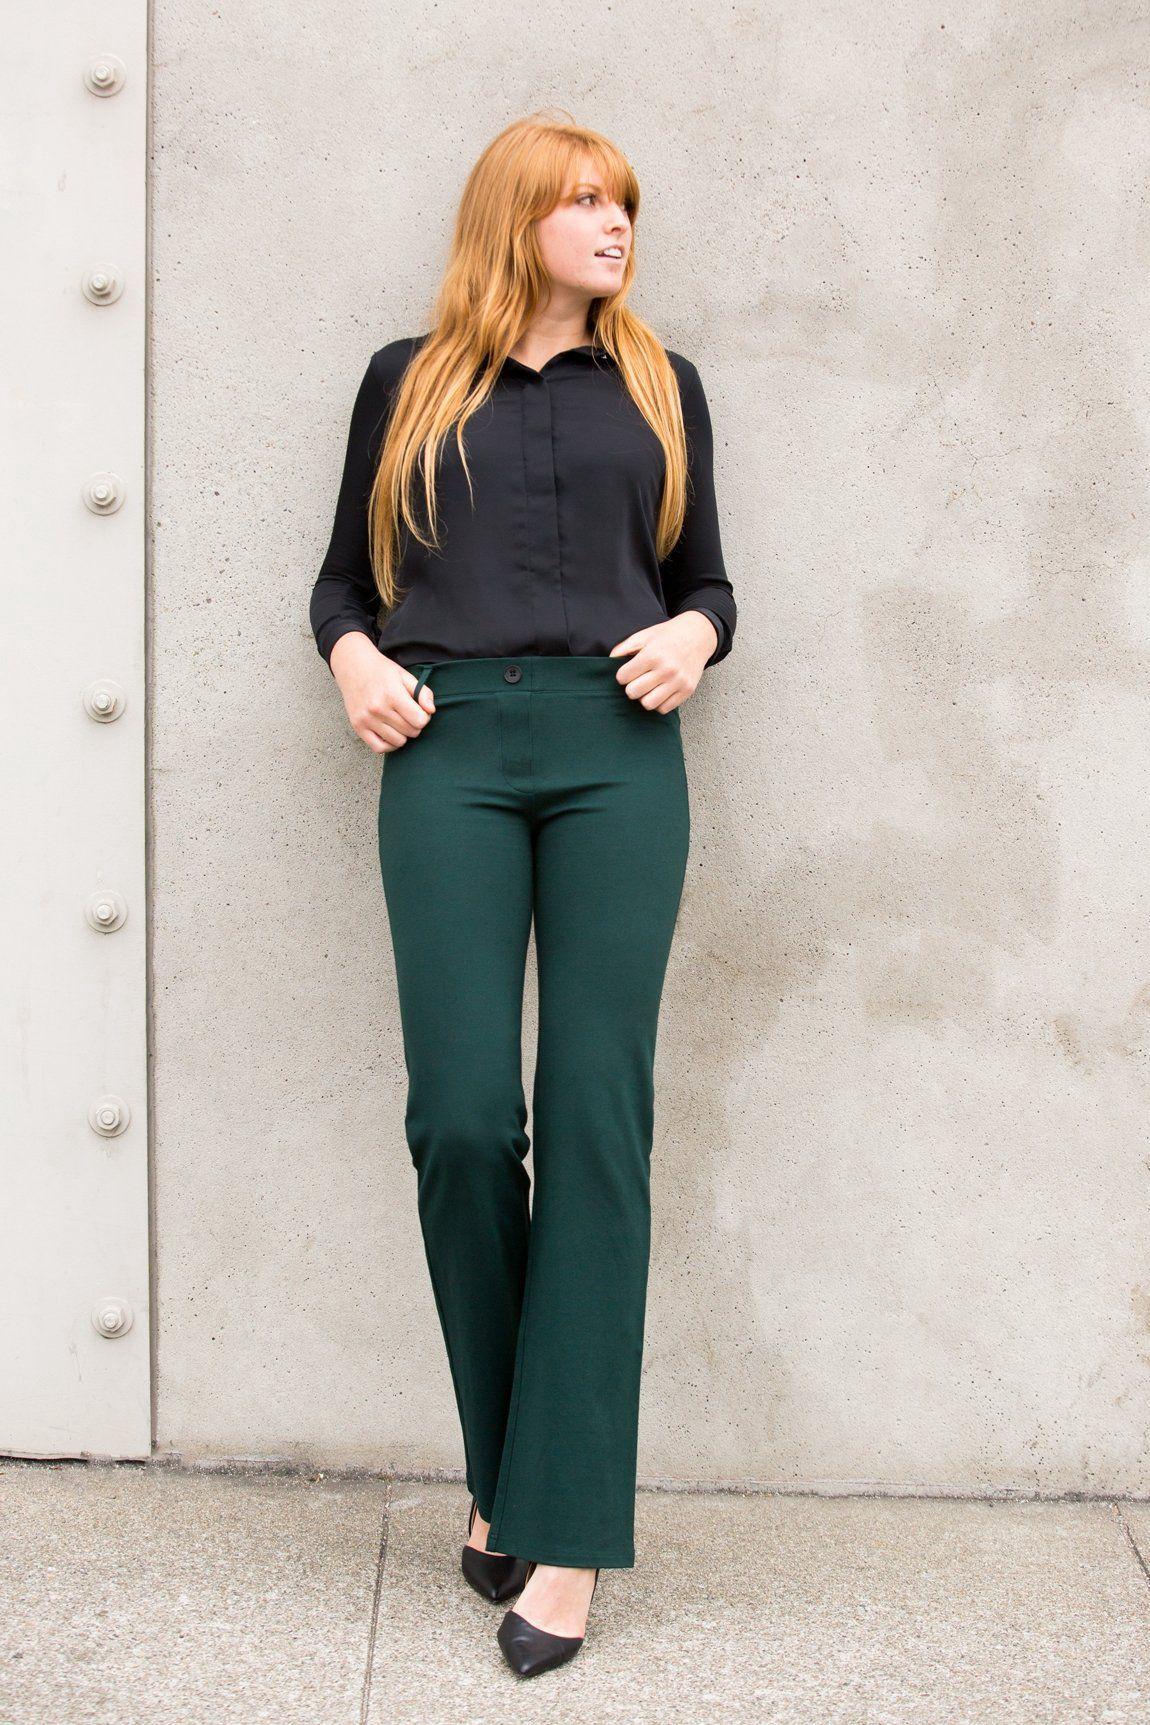 159b15128e928 Boot-Cut | Emerald-Twill Dress Pant Yoga Pants | Athleisure Dress ...